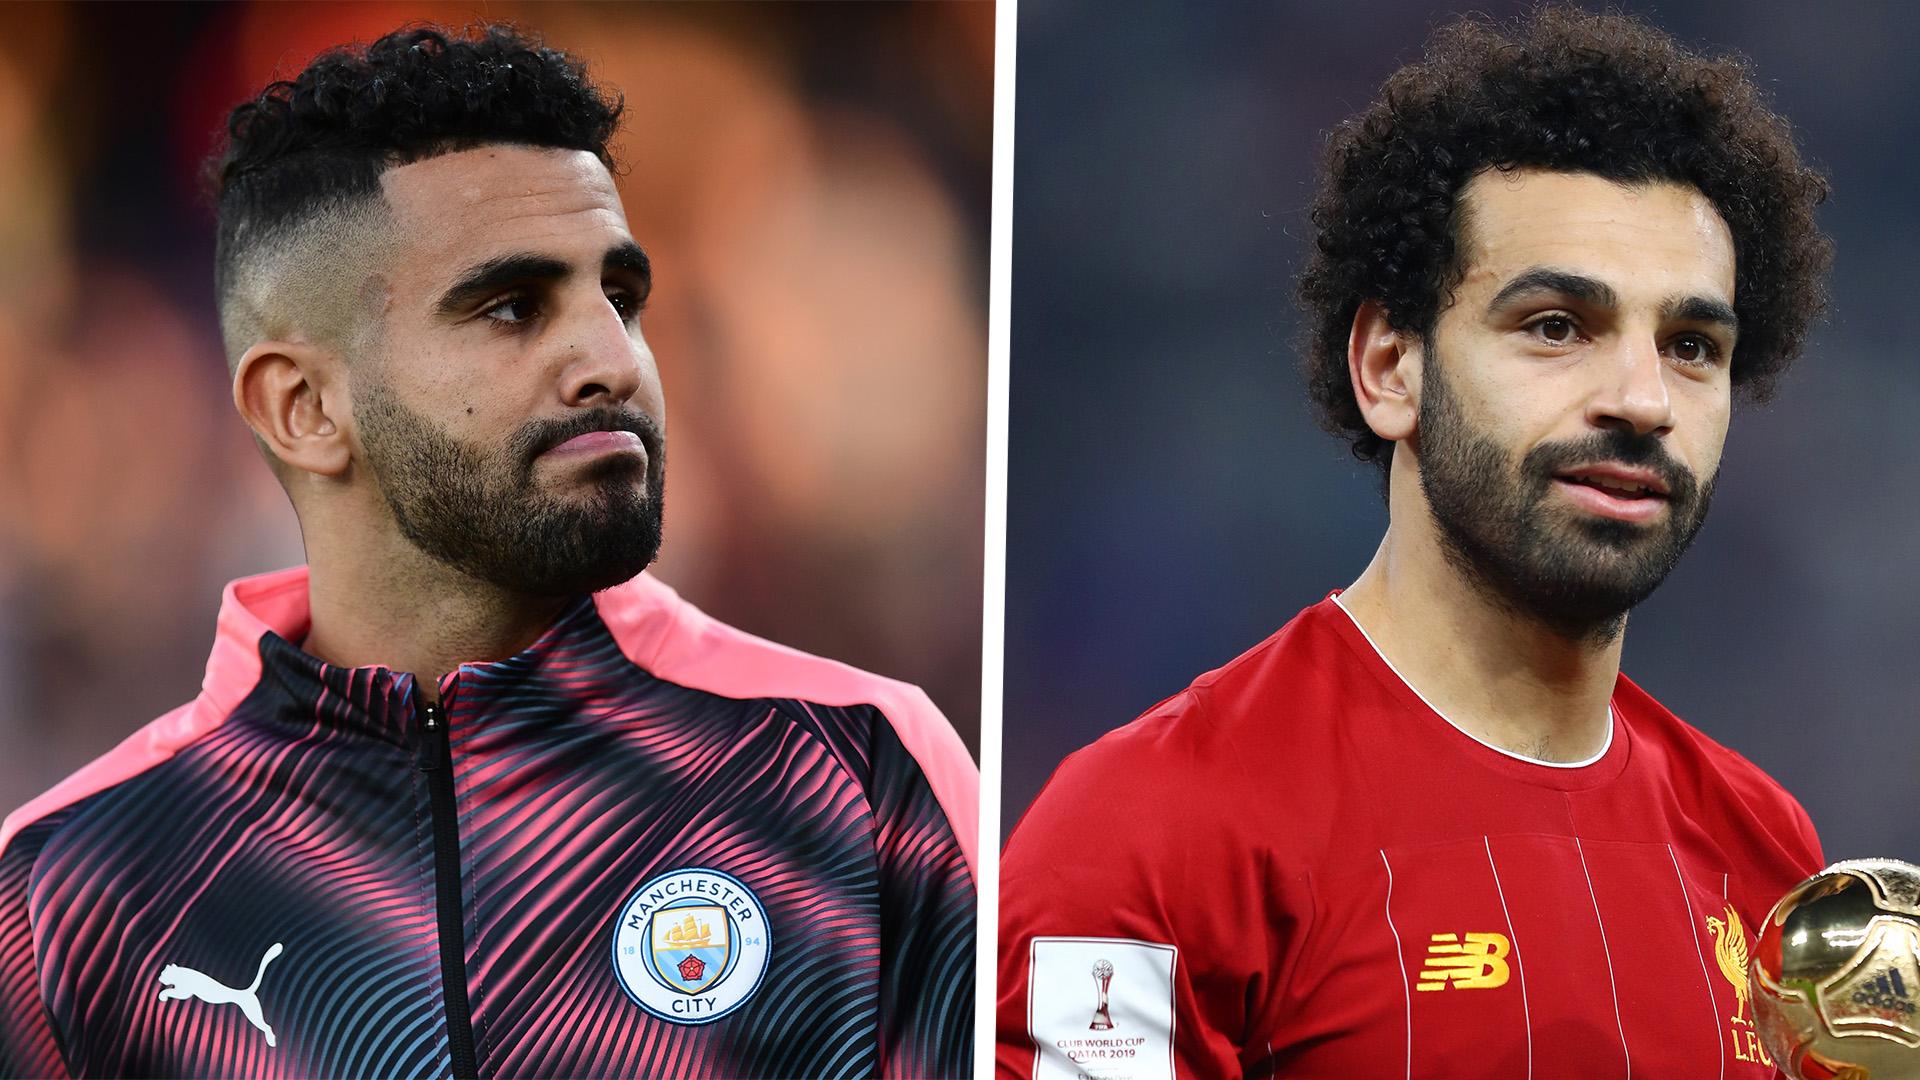 CAF Awards 2019 : La présence de Riyad Mahrez et Mohamed Salah incertaine…